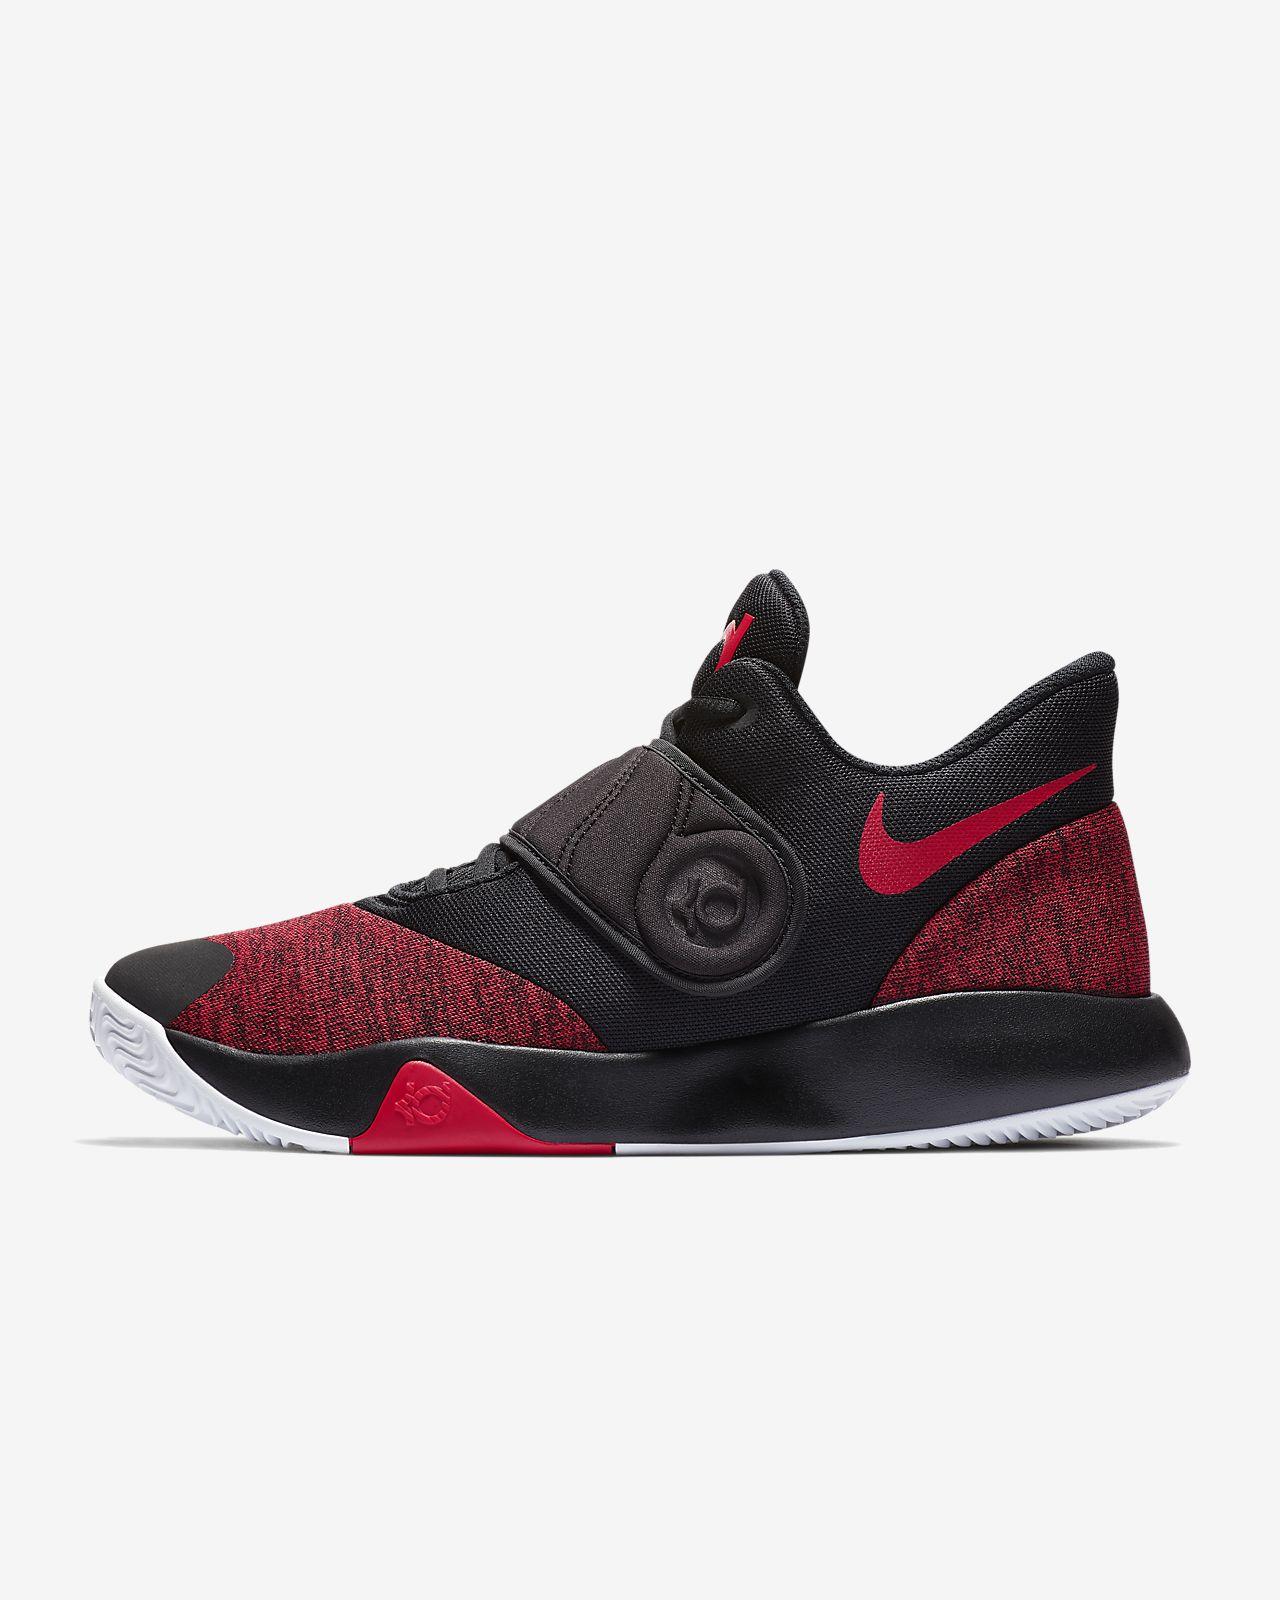 Nike KD Trey 5 VI Basketball Shoe